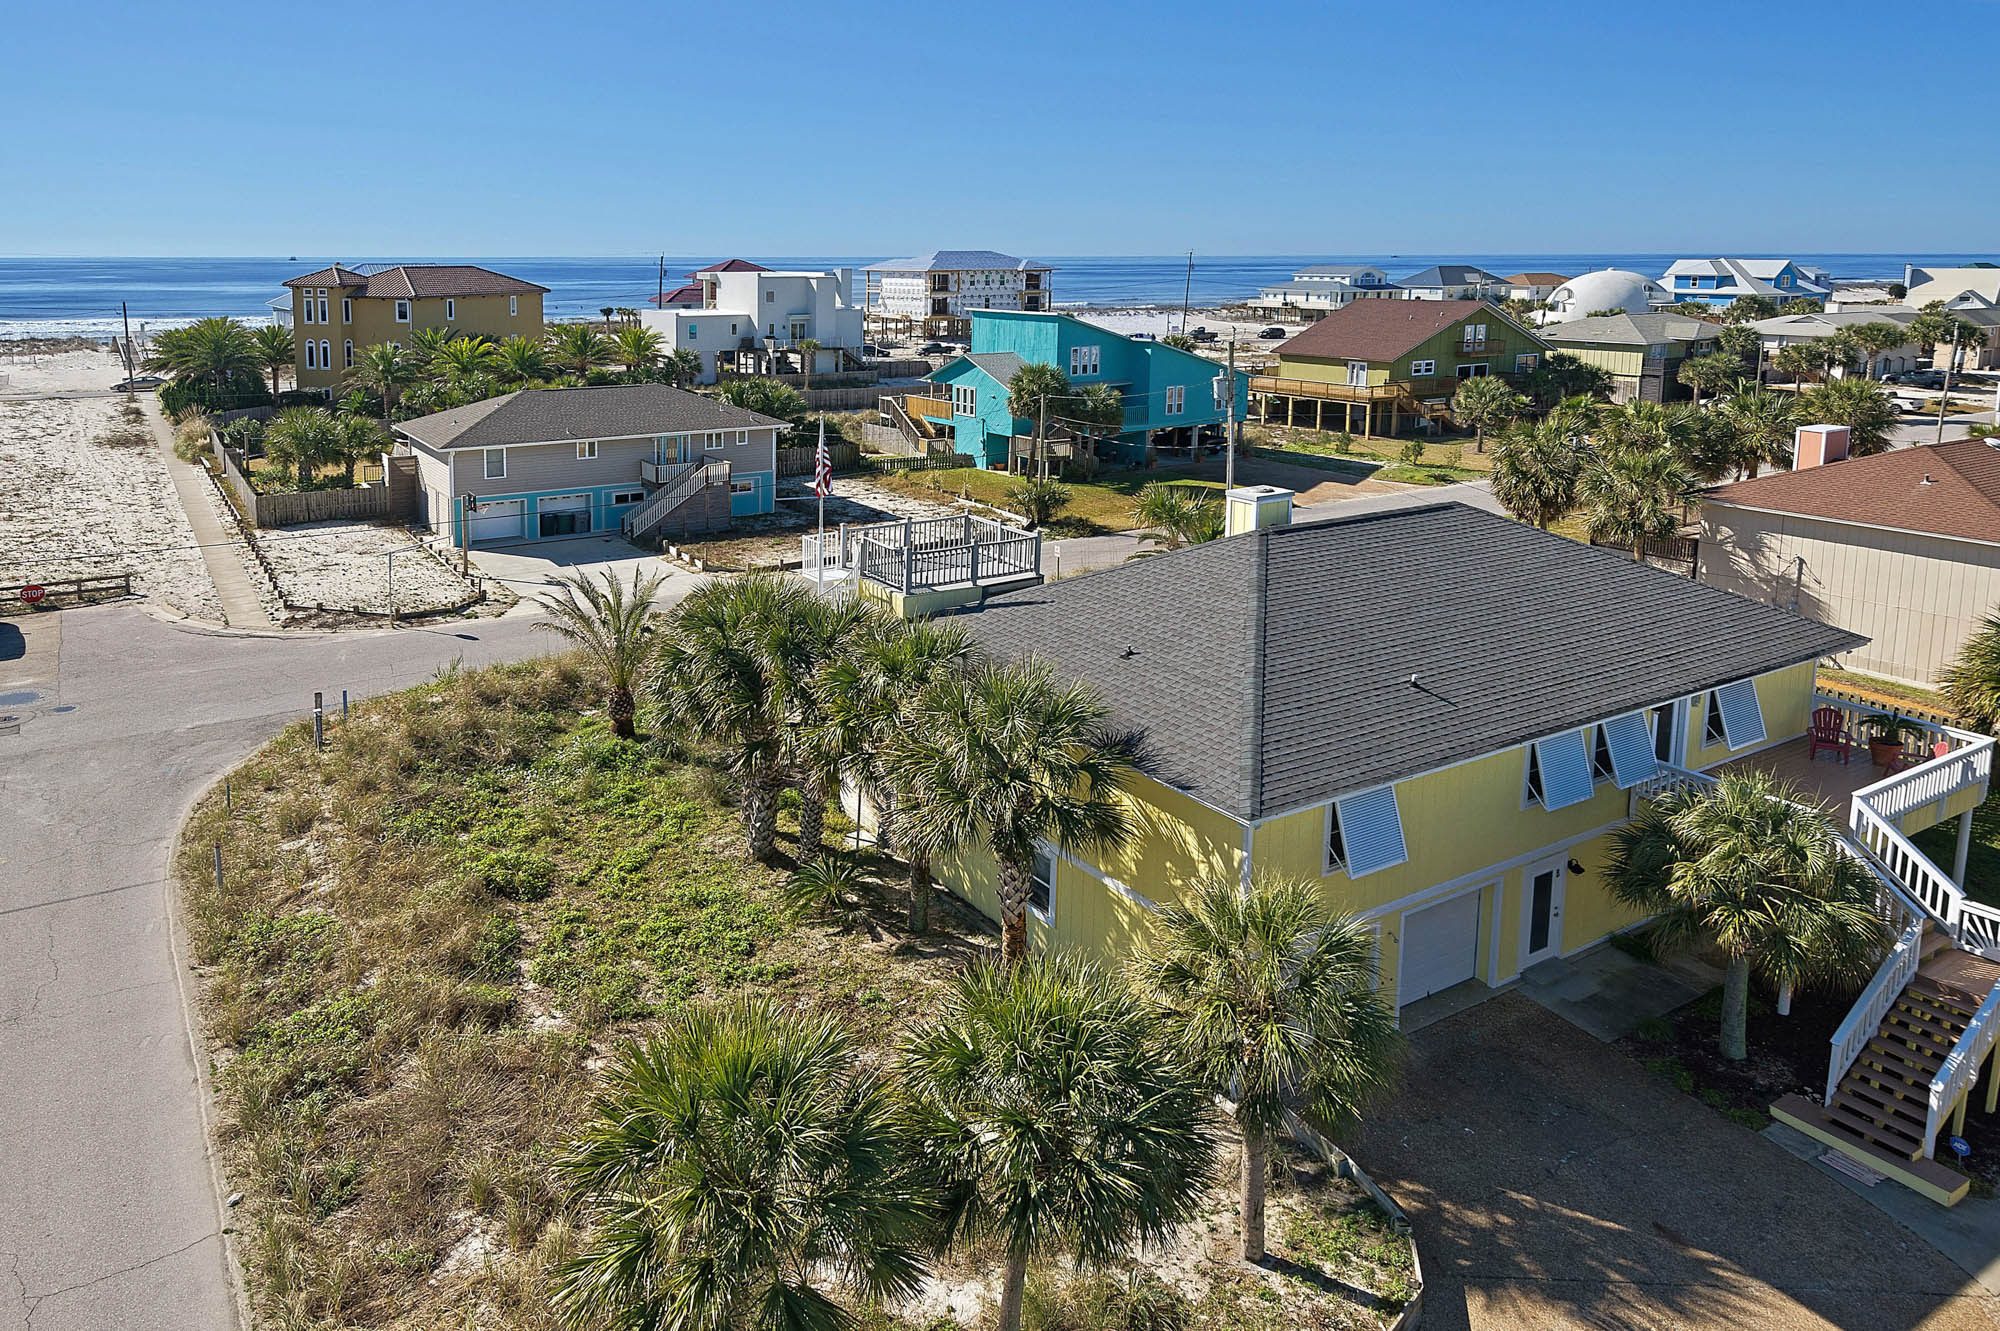 Maldonado 1015 - Sea the Big Picture House/Cottage rental in Pensacola Beach House Rentals in Pensacola Beach Florida - #1